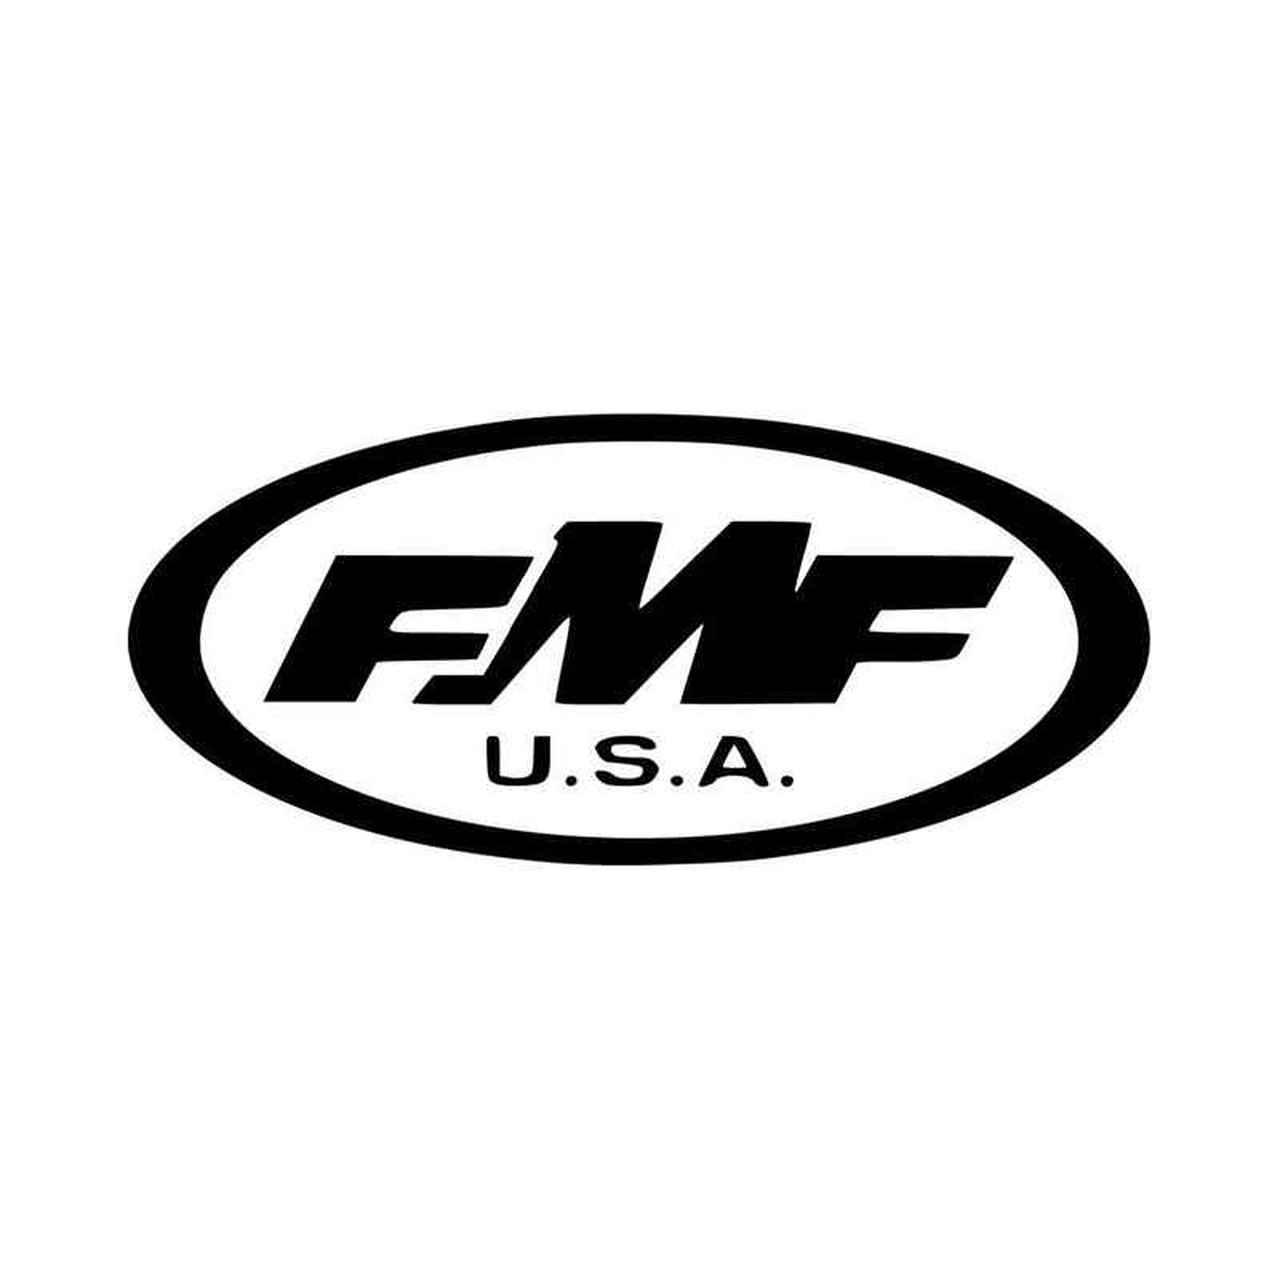 Fmf Logo Car Vinyl Decal Sticker.